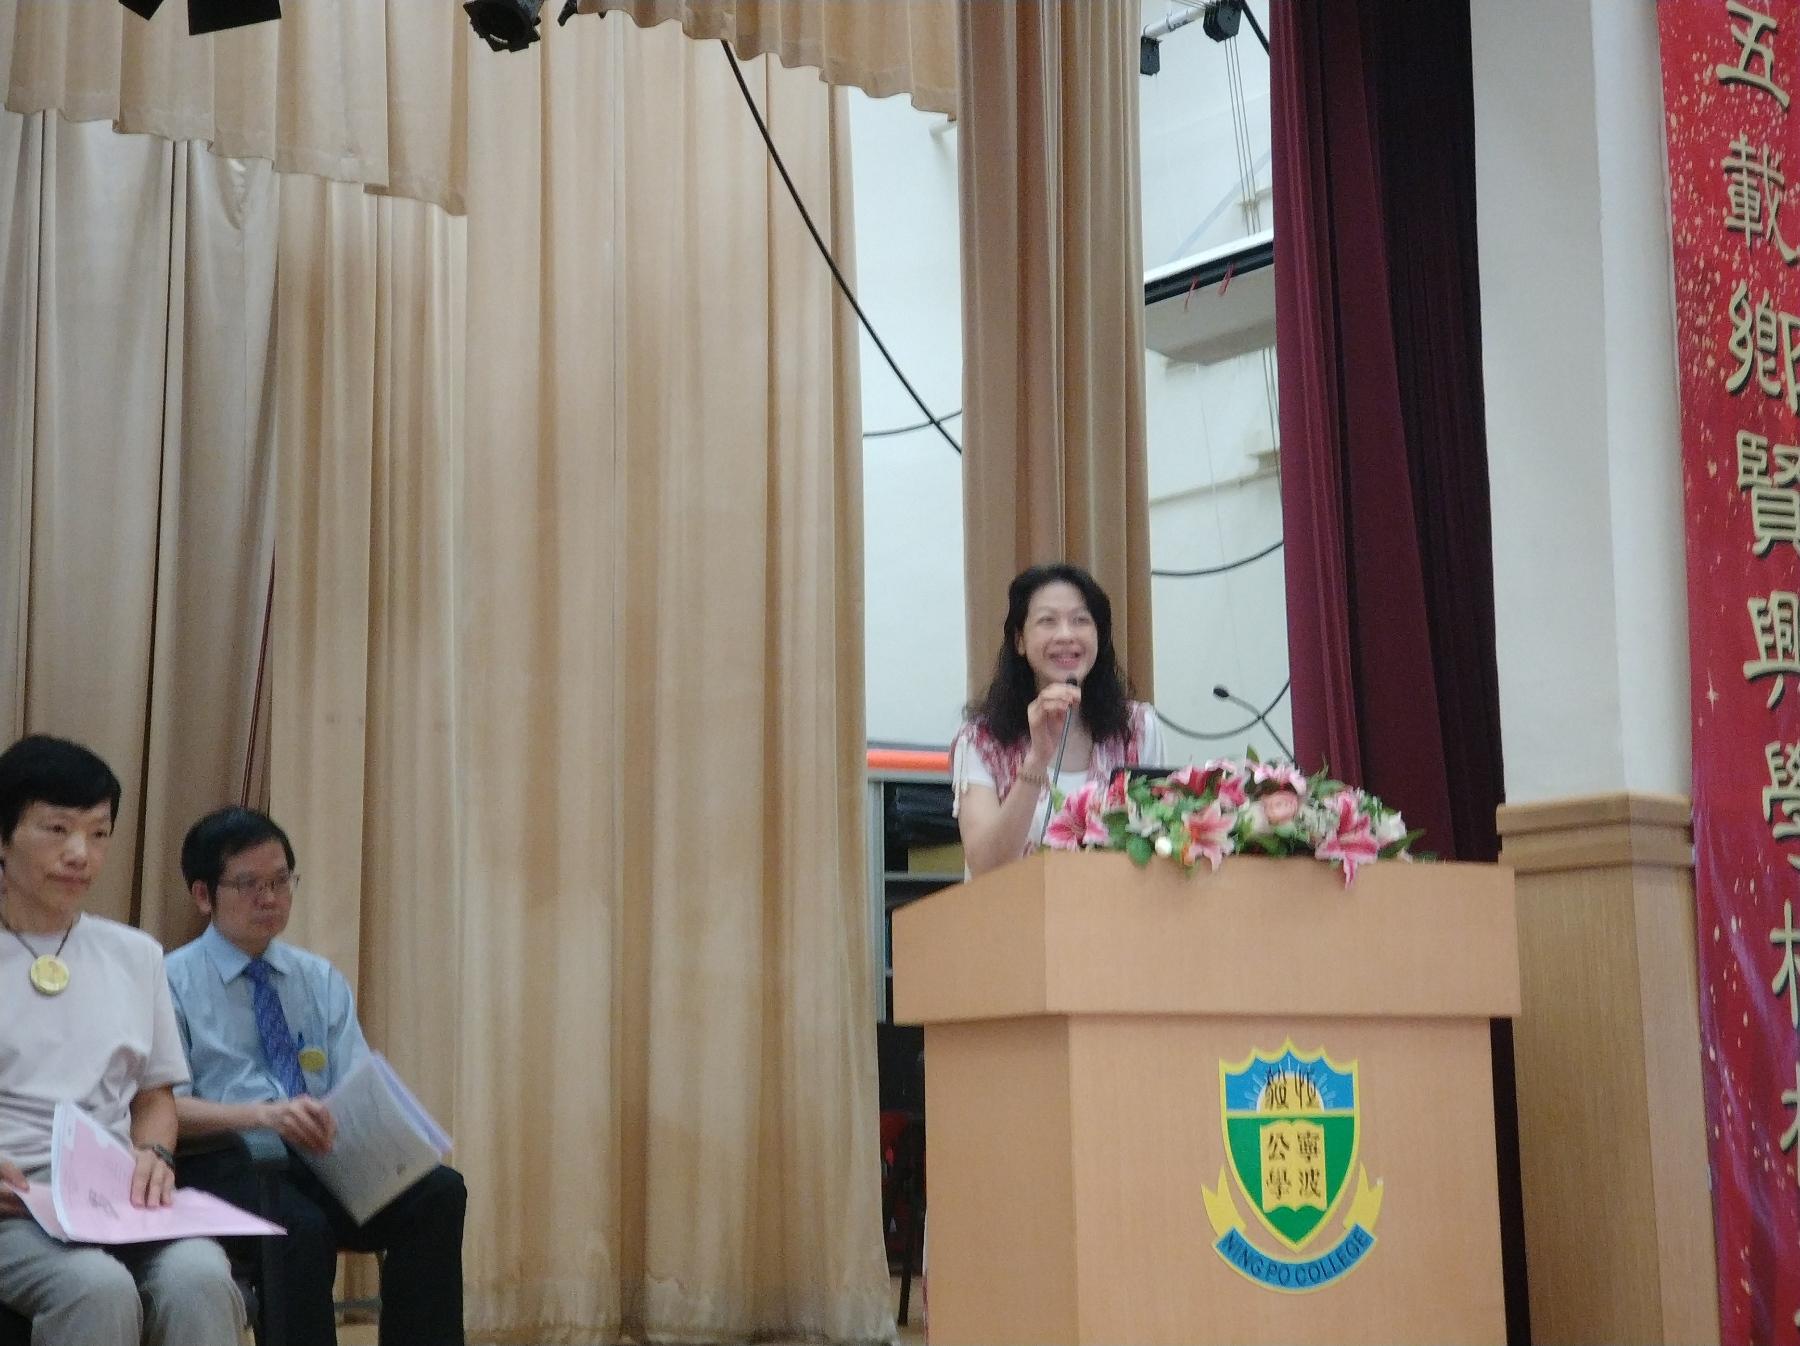 https://npc.edu.hk/sites/default/files/img_20190811_095544.jpg